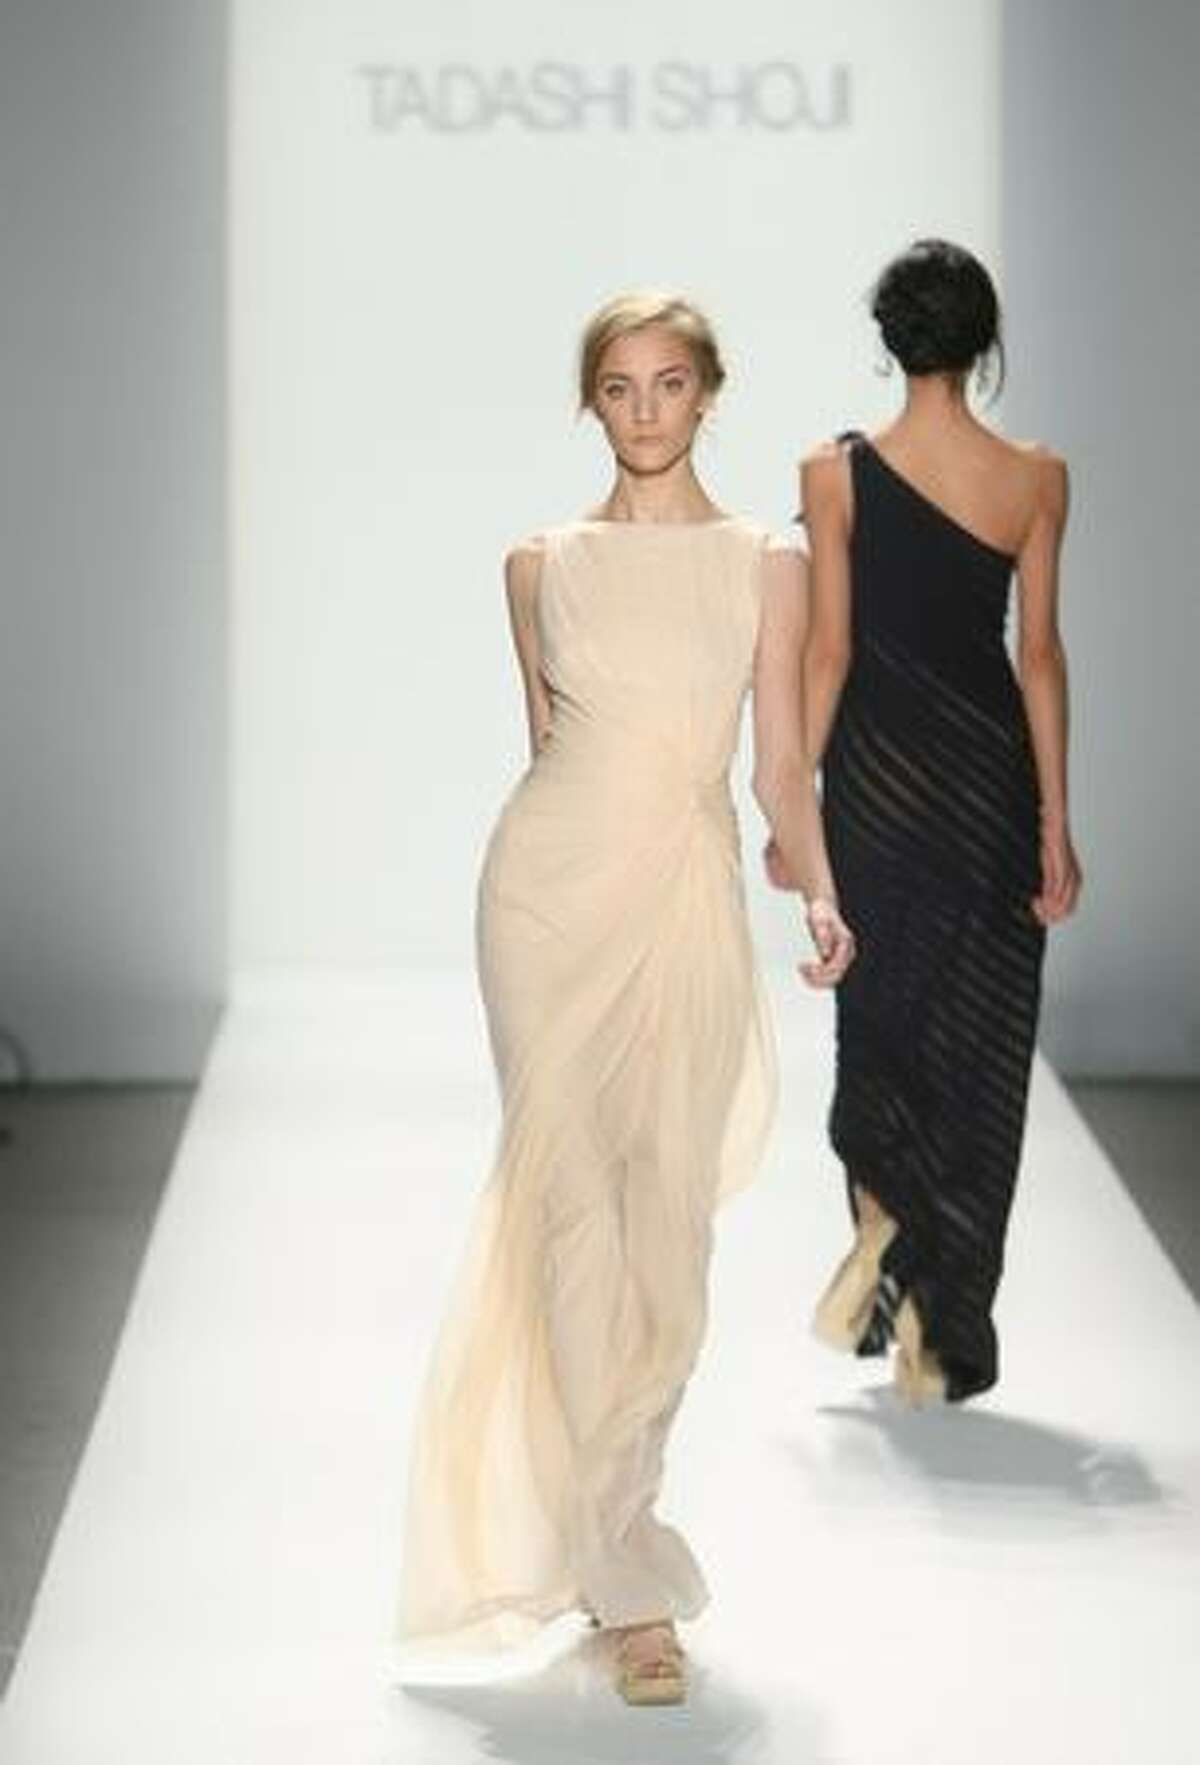 A model walks the runway at Tadashi Shoji Spring 2010 fashion show at the Salon at Bryant Park in New York City.